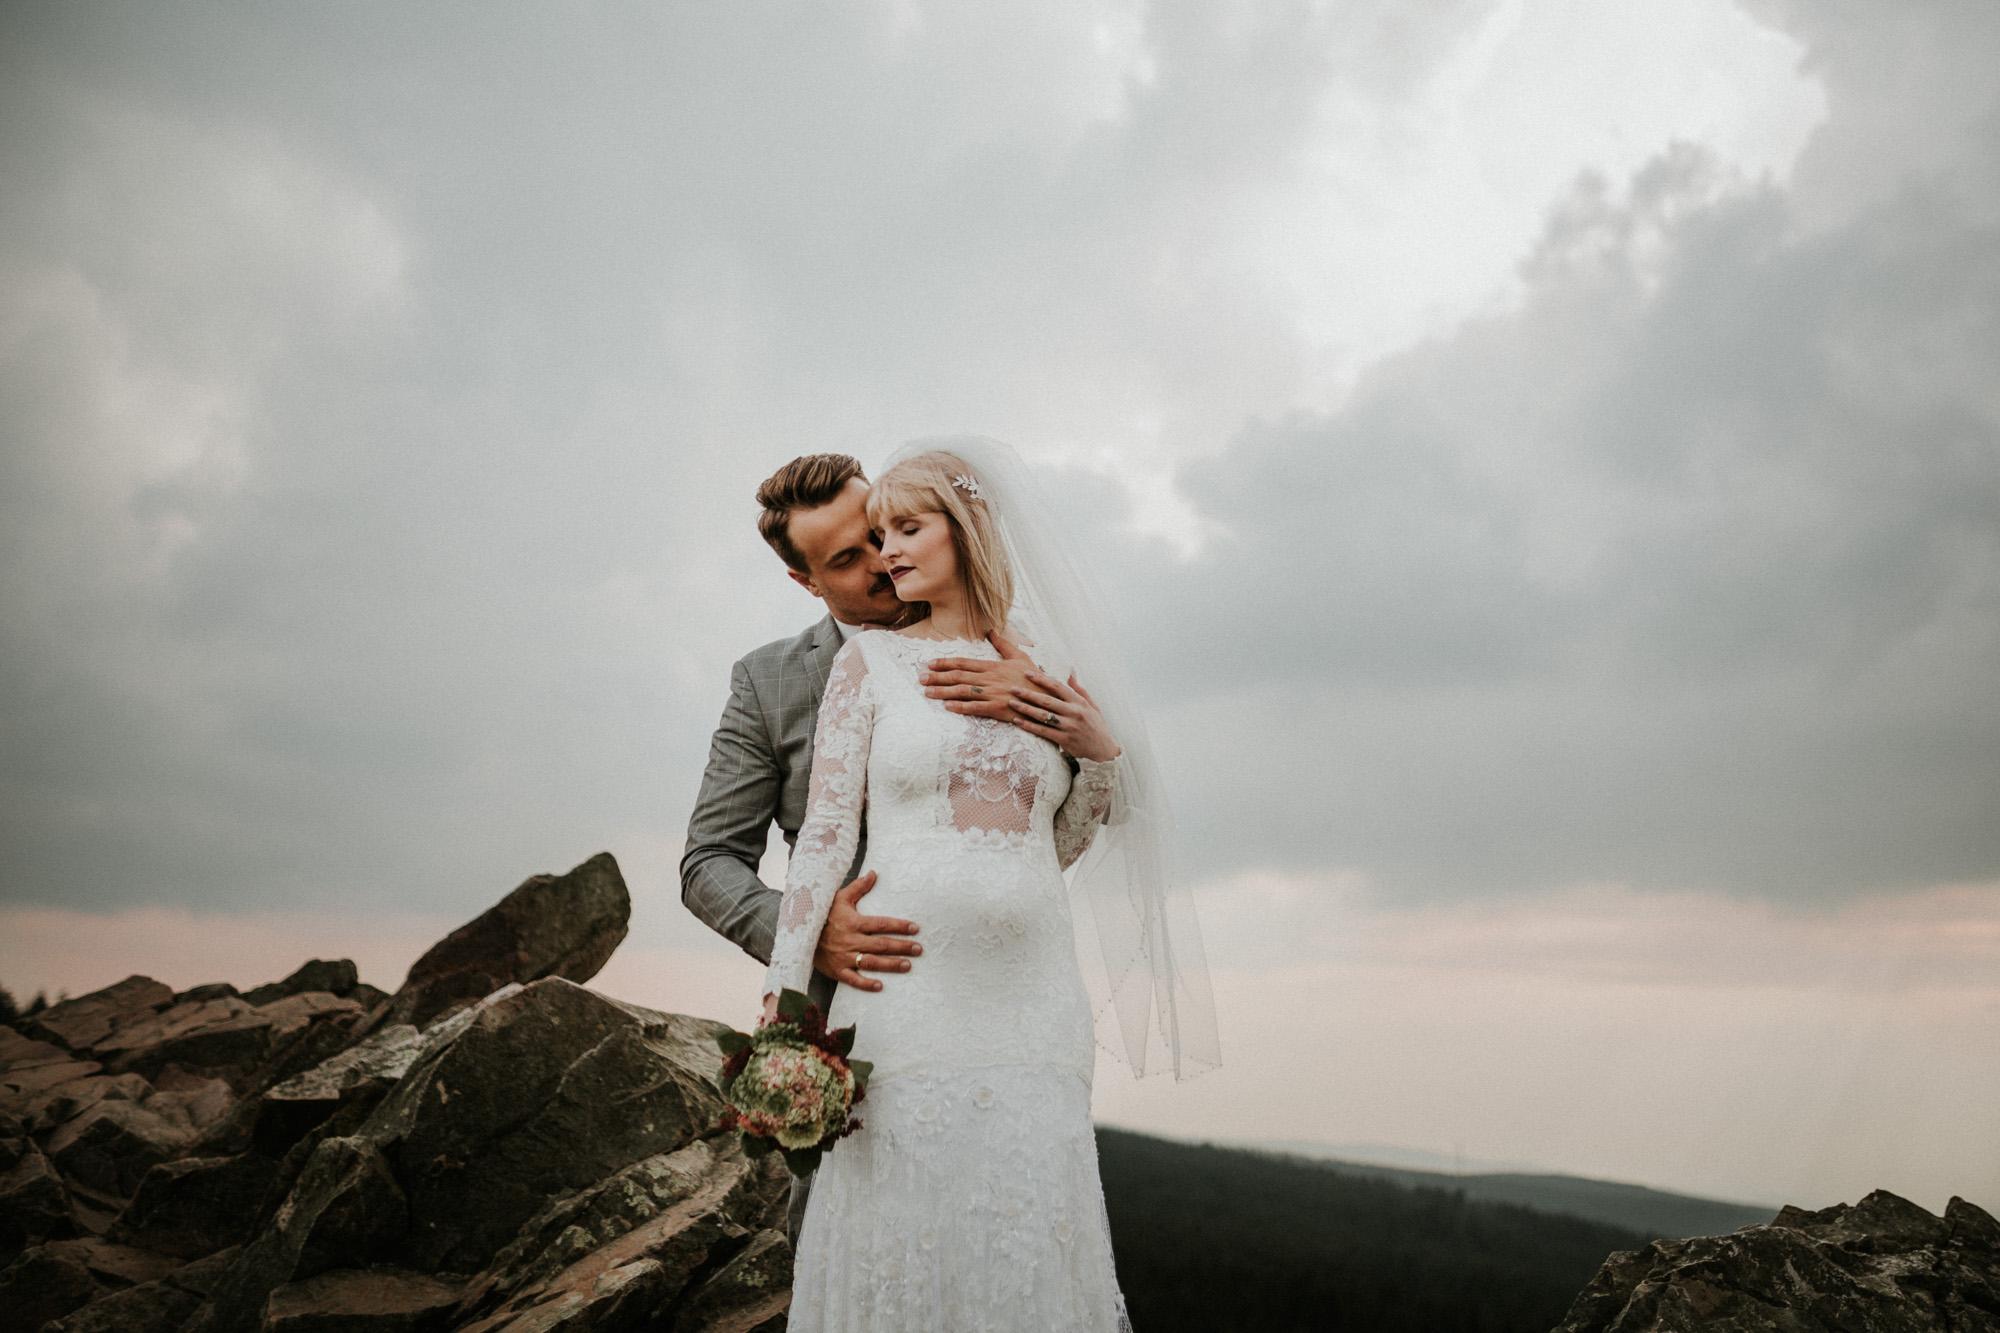 DanielaMarquardtPhotography_Hochzeitsfotograf_Düsseldorf_Köln_Mallorca_Bayern_Austria_Harz_LinaundMaik_Afterwedding-Shooting_Weddingphotographer_Ibiza_Tuskany_Italien_Toskana18